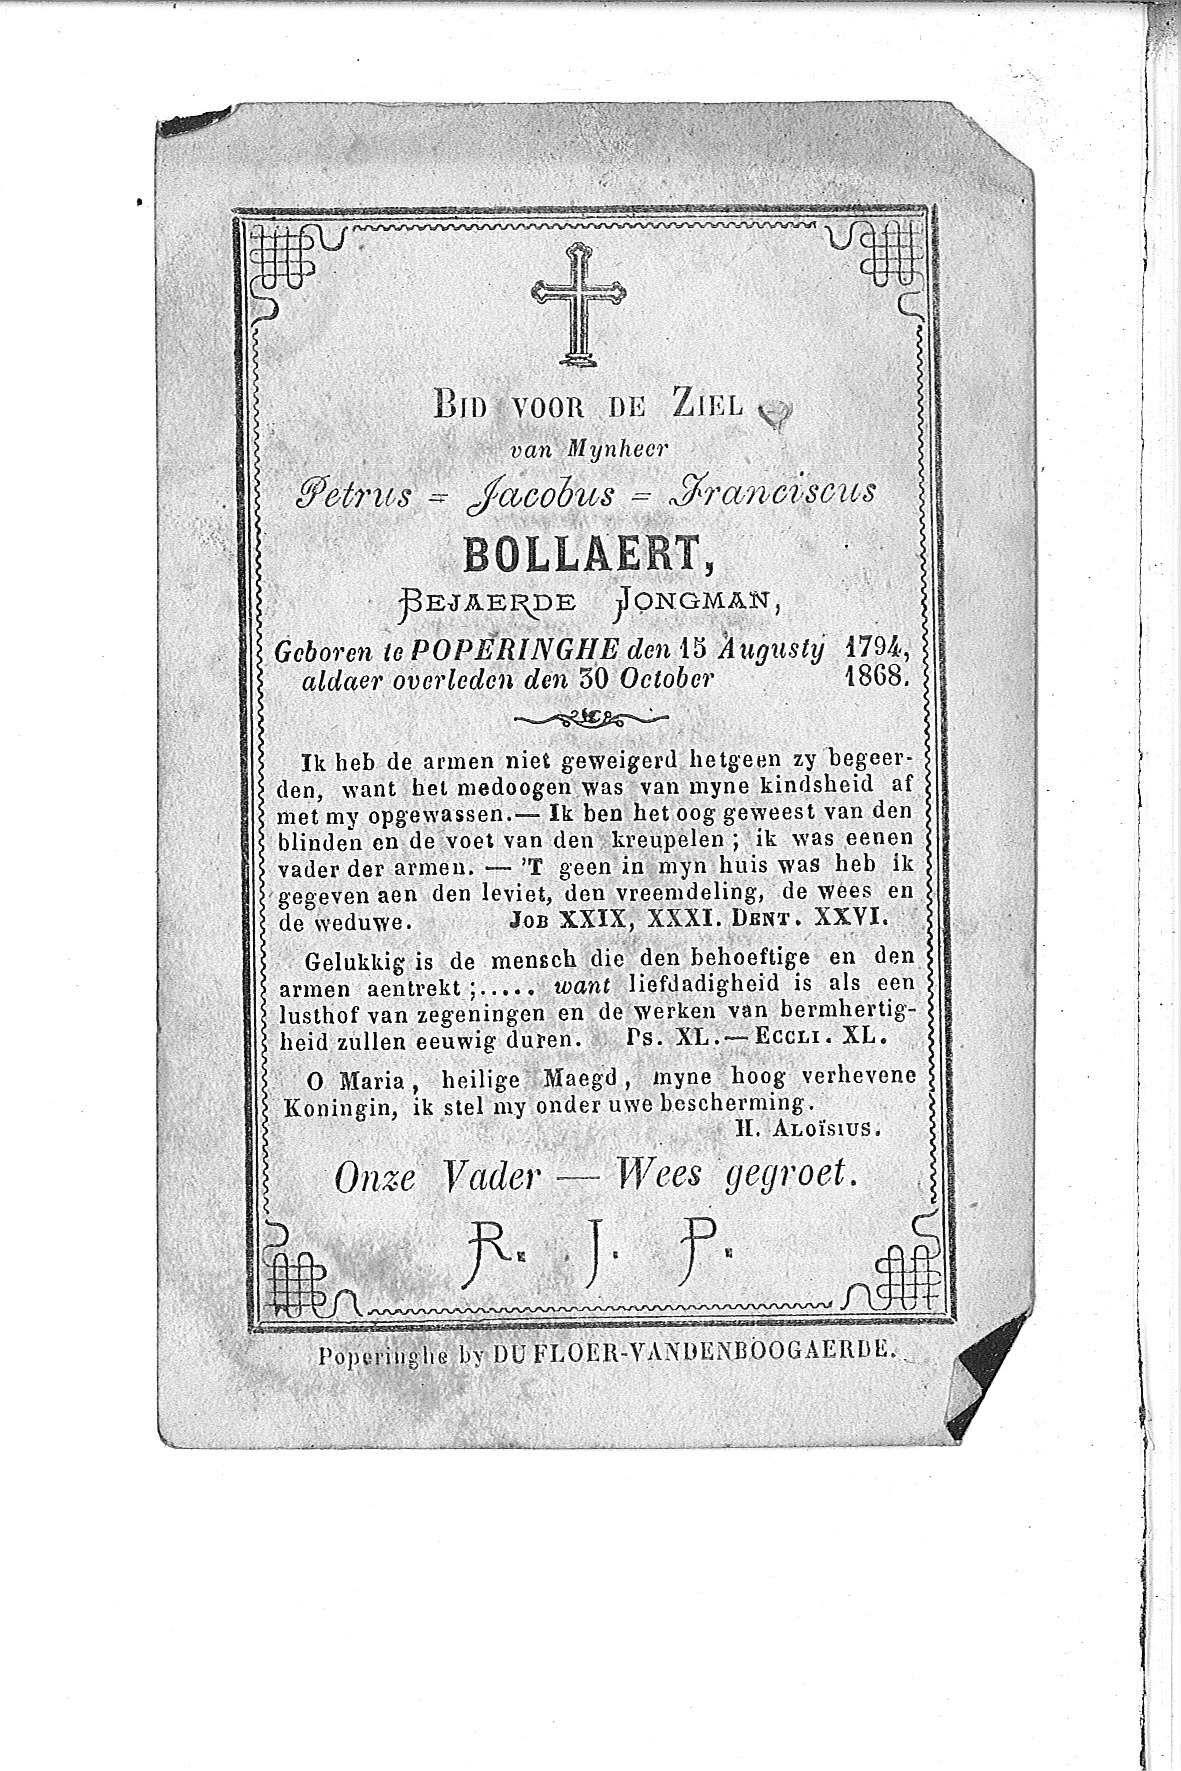 Bollaert(1868)20110321161618_00030.jpg